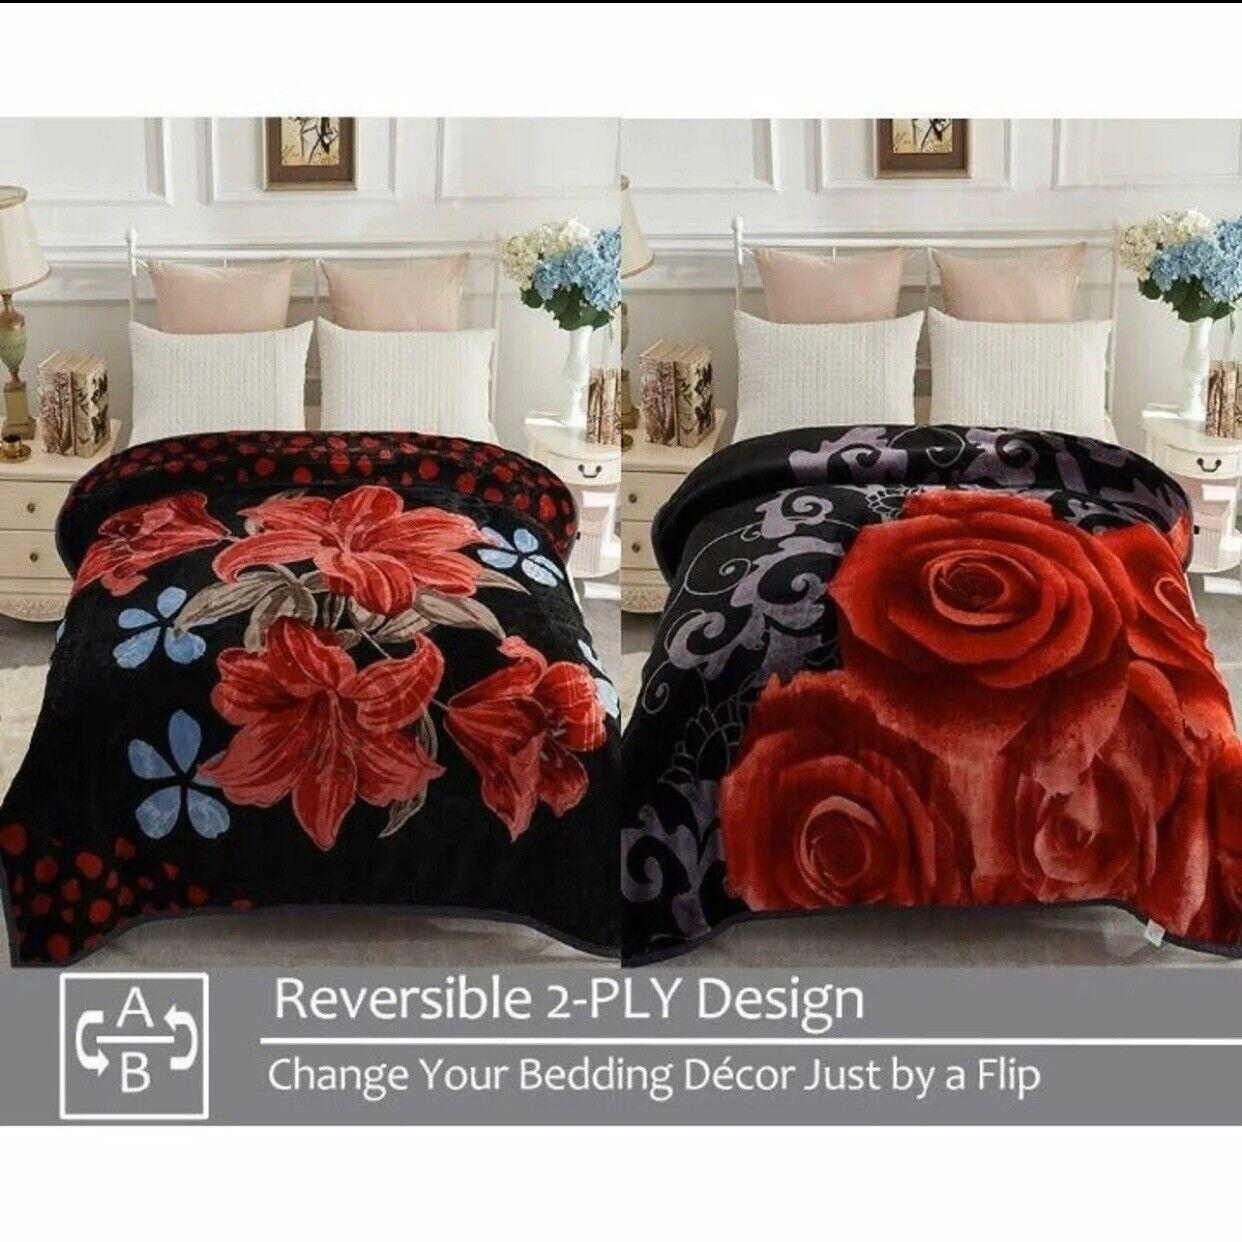 Heavy Weight Double Side Queen Size Super Soft Mink Blankets Flowers 371 For Sale Online Ebay